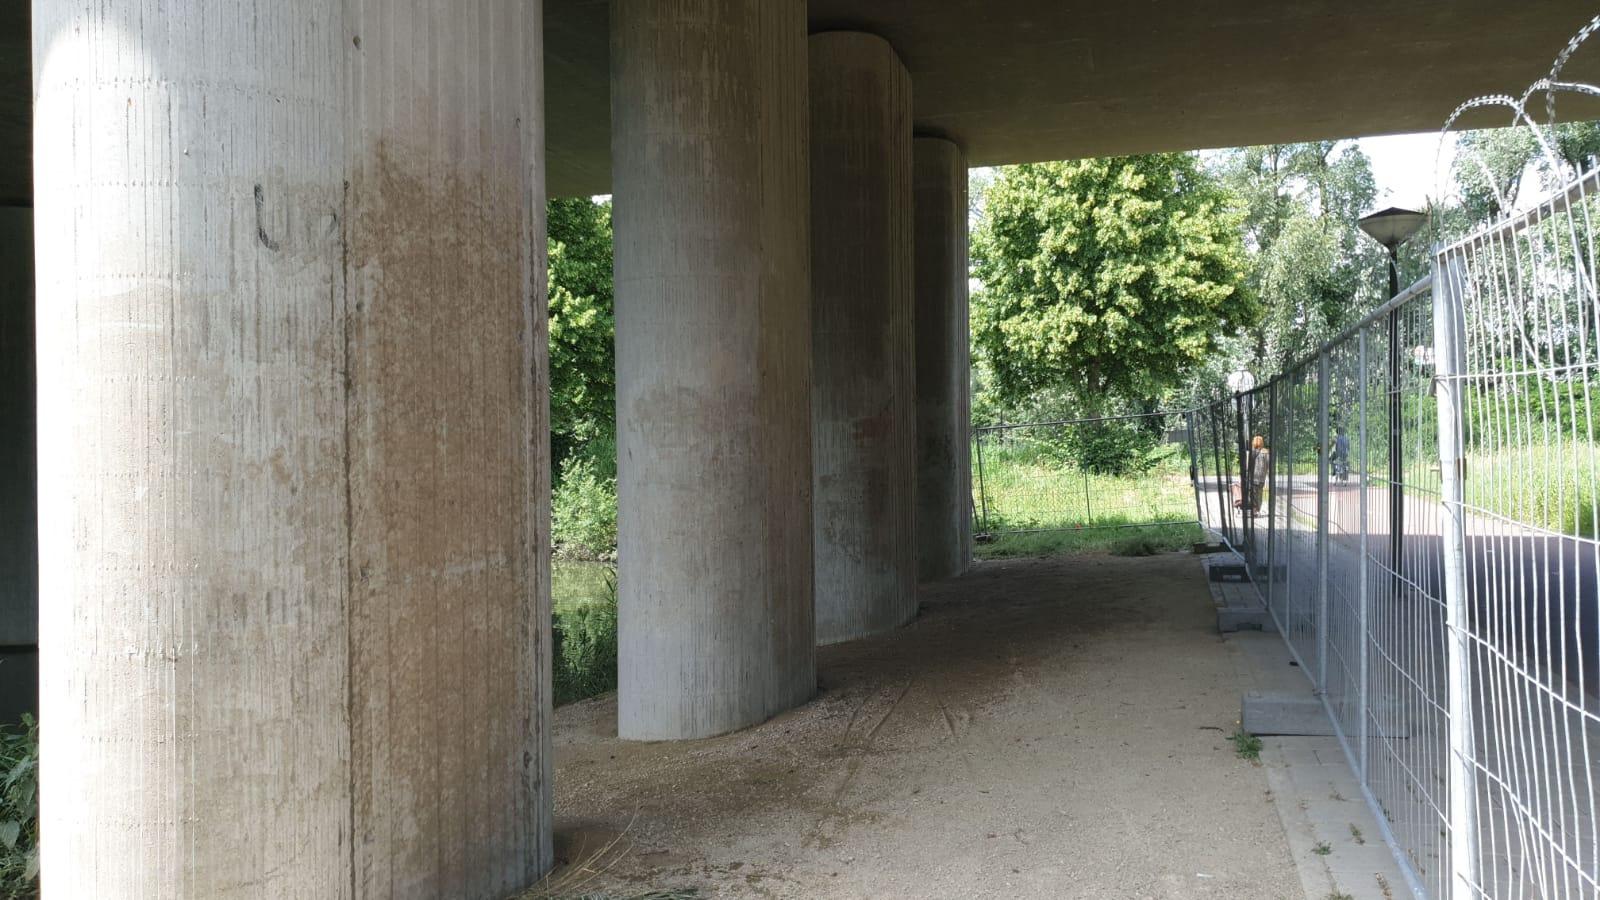 Effectieve graffiti verwijdering beton